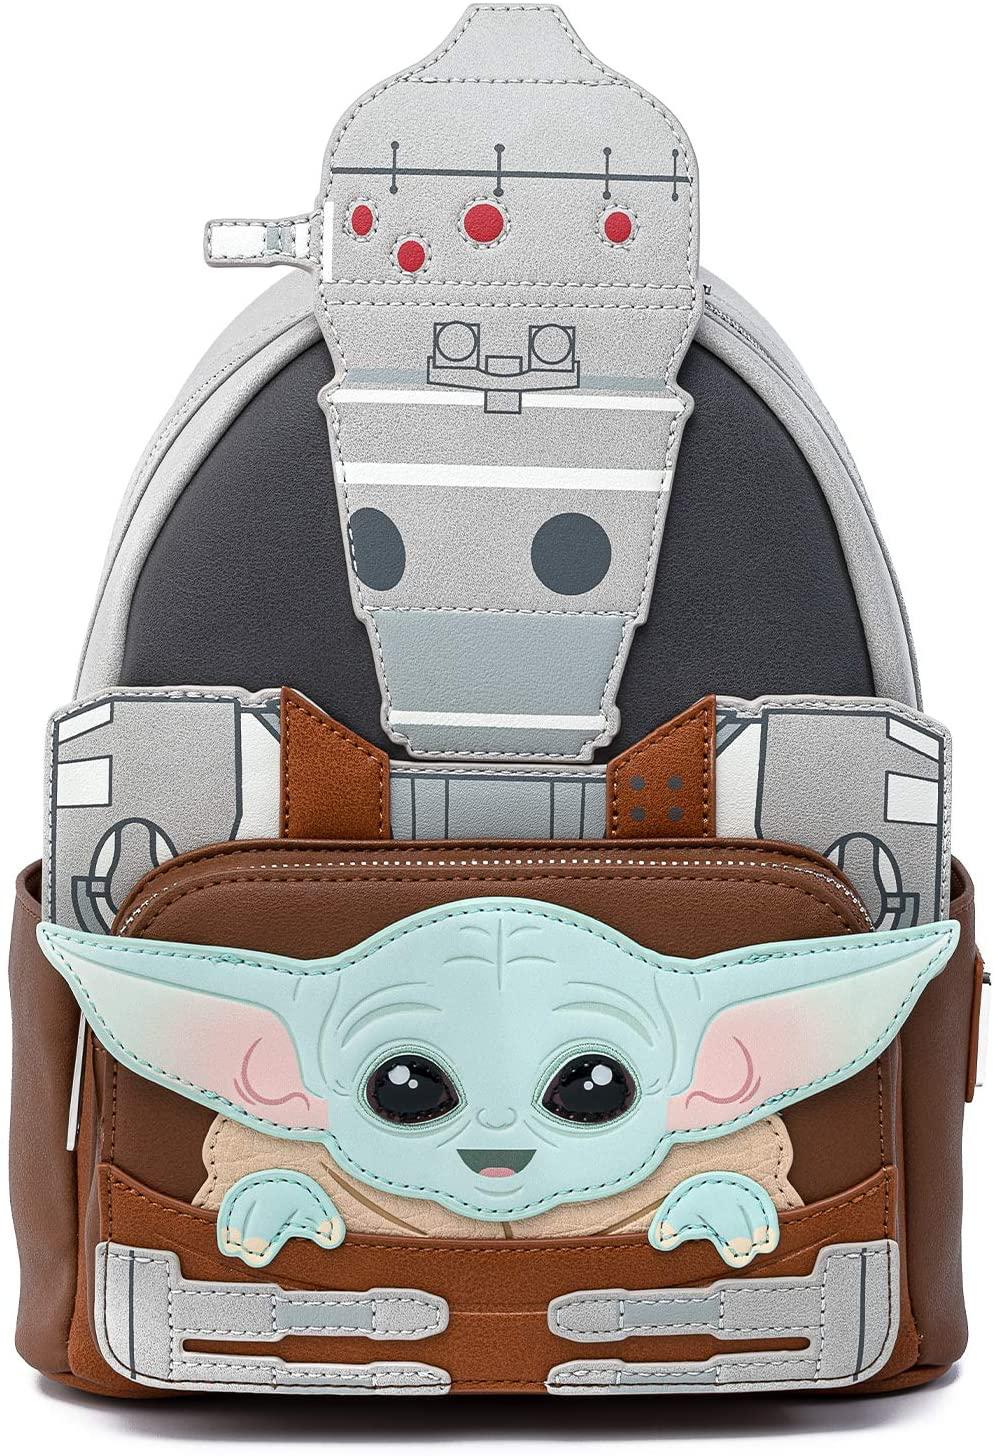 TM The Child (Grogu) and IG-11 Mini Cosplay Backpack 1